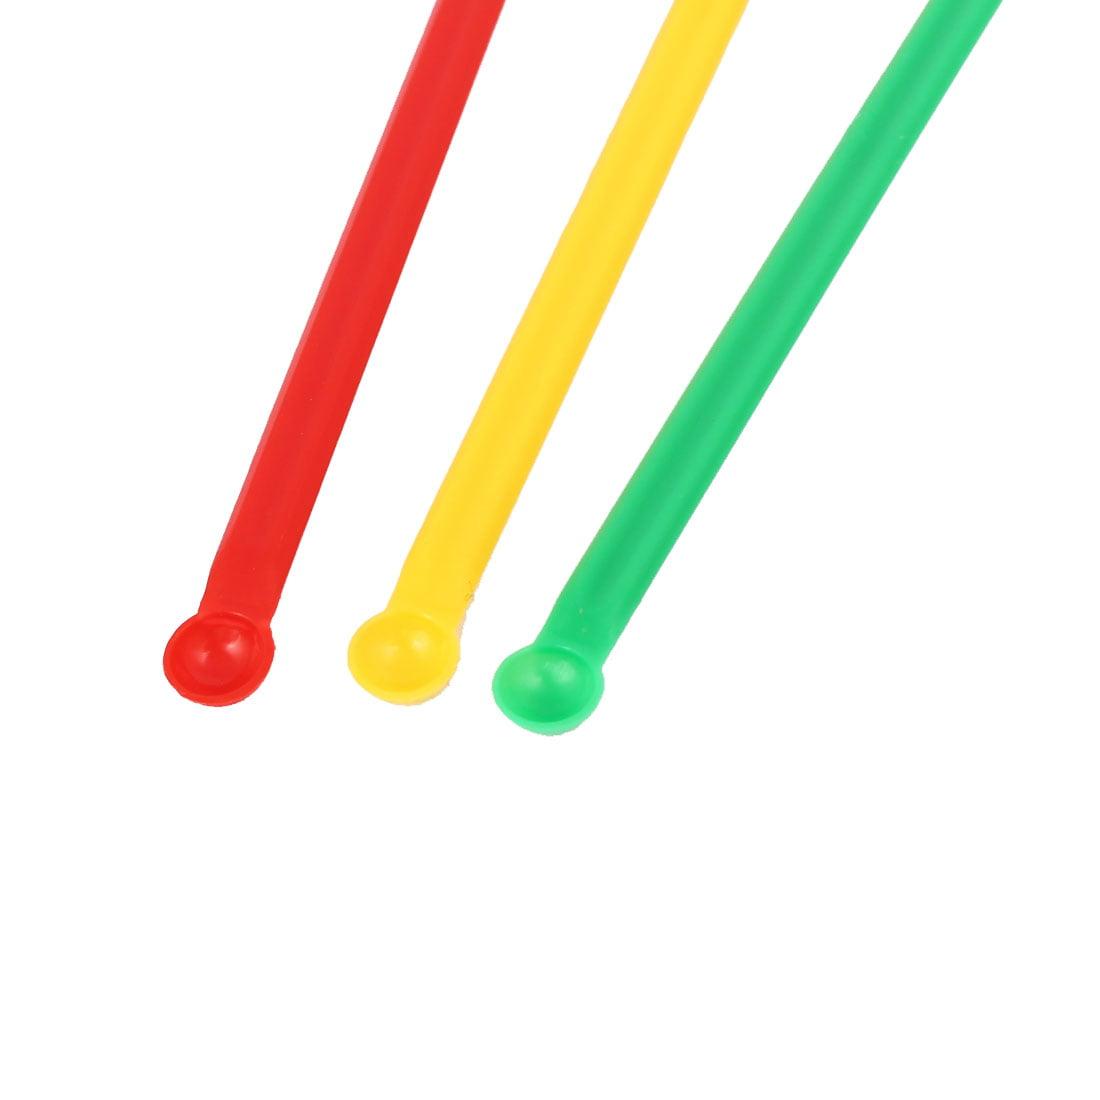 Laboratory Plastic Reagent Sampling Spoon  Spoon 3 in 10 Set - image 2 of 3